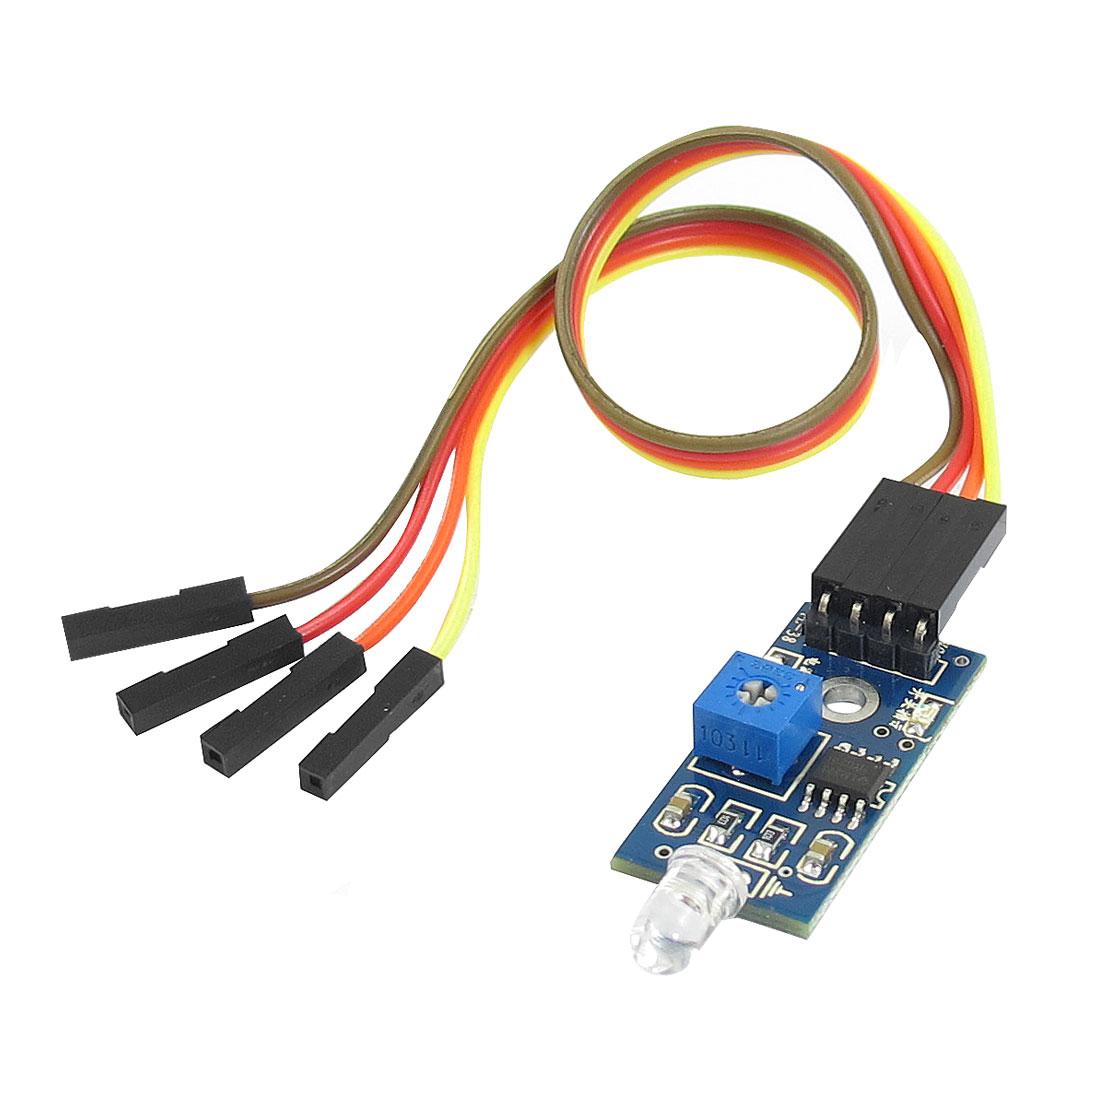 Brightness Detect 4 Pins 2 Channel Photosensitive Diode Sensor Module w 4-Wire